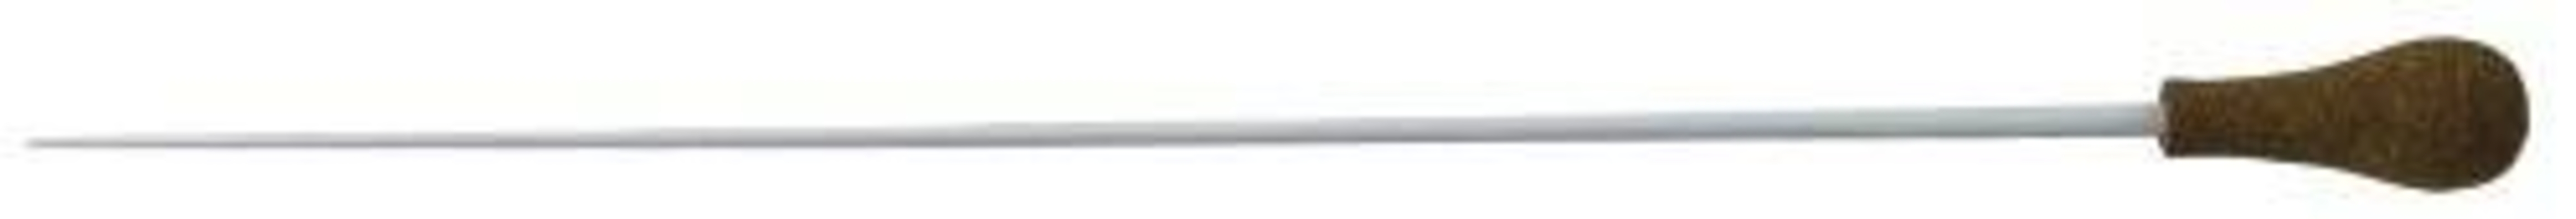 Gewa 912304 Baguette de direction 37 cm liège